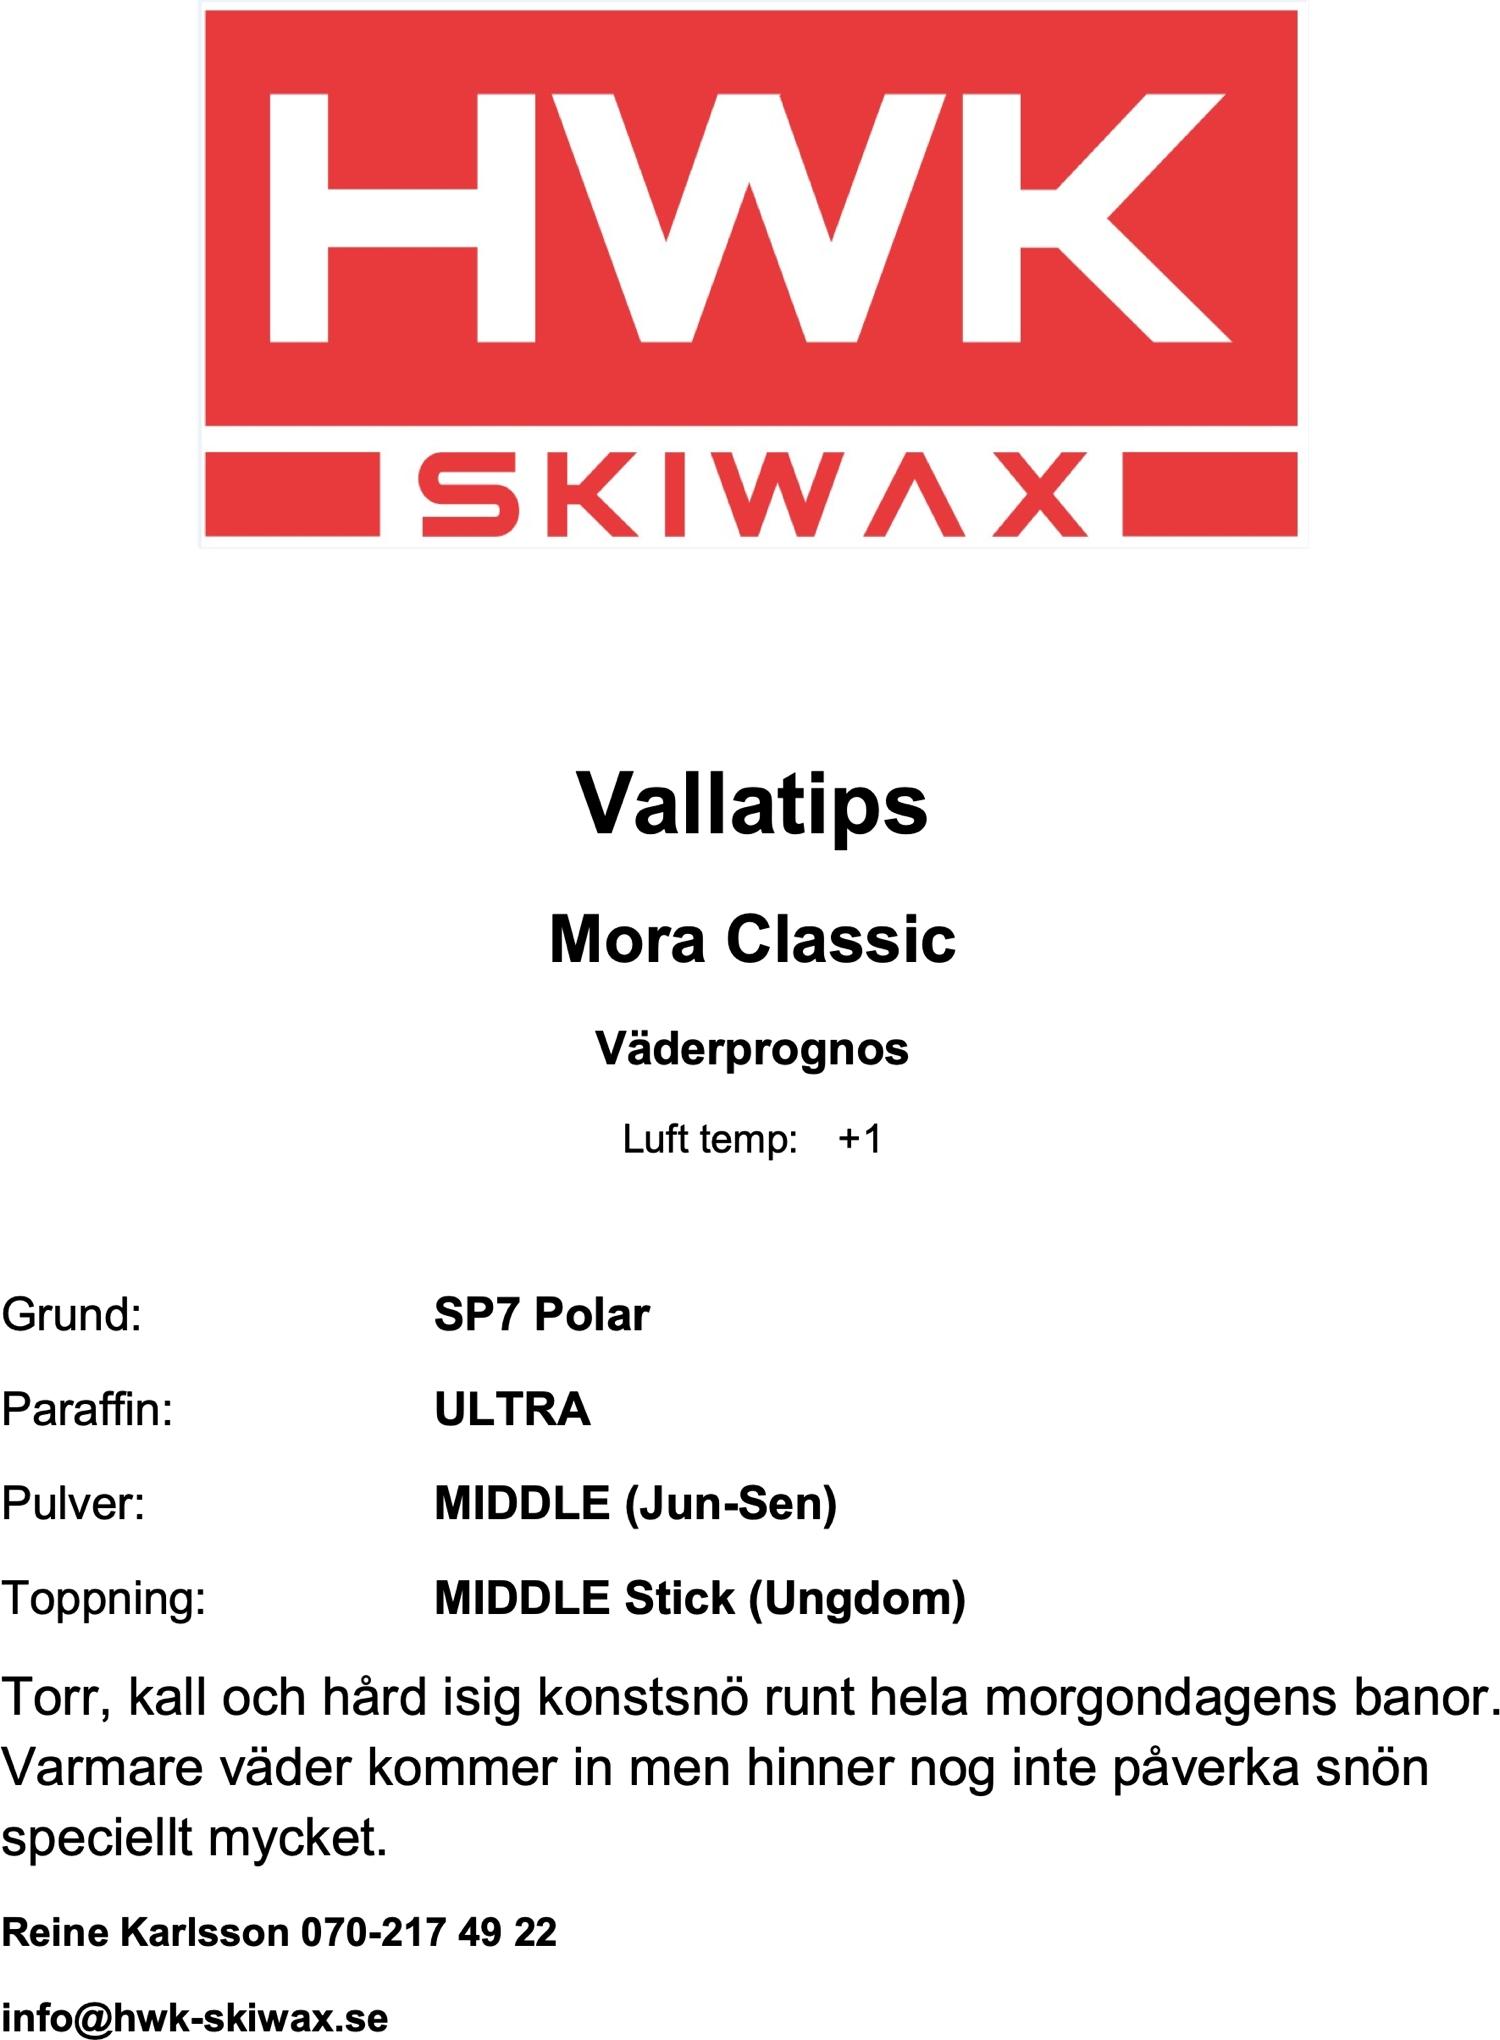 hwk_moraclassic.jpg